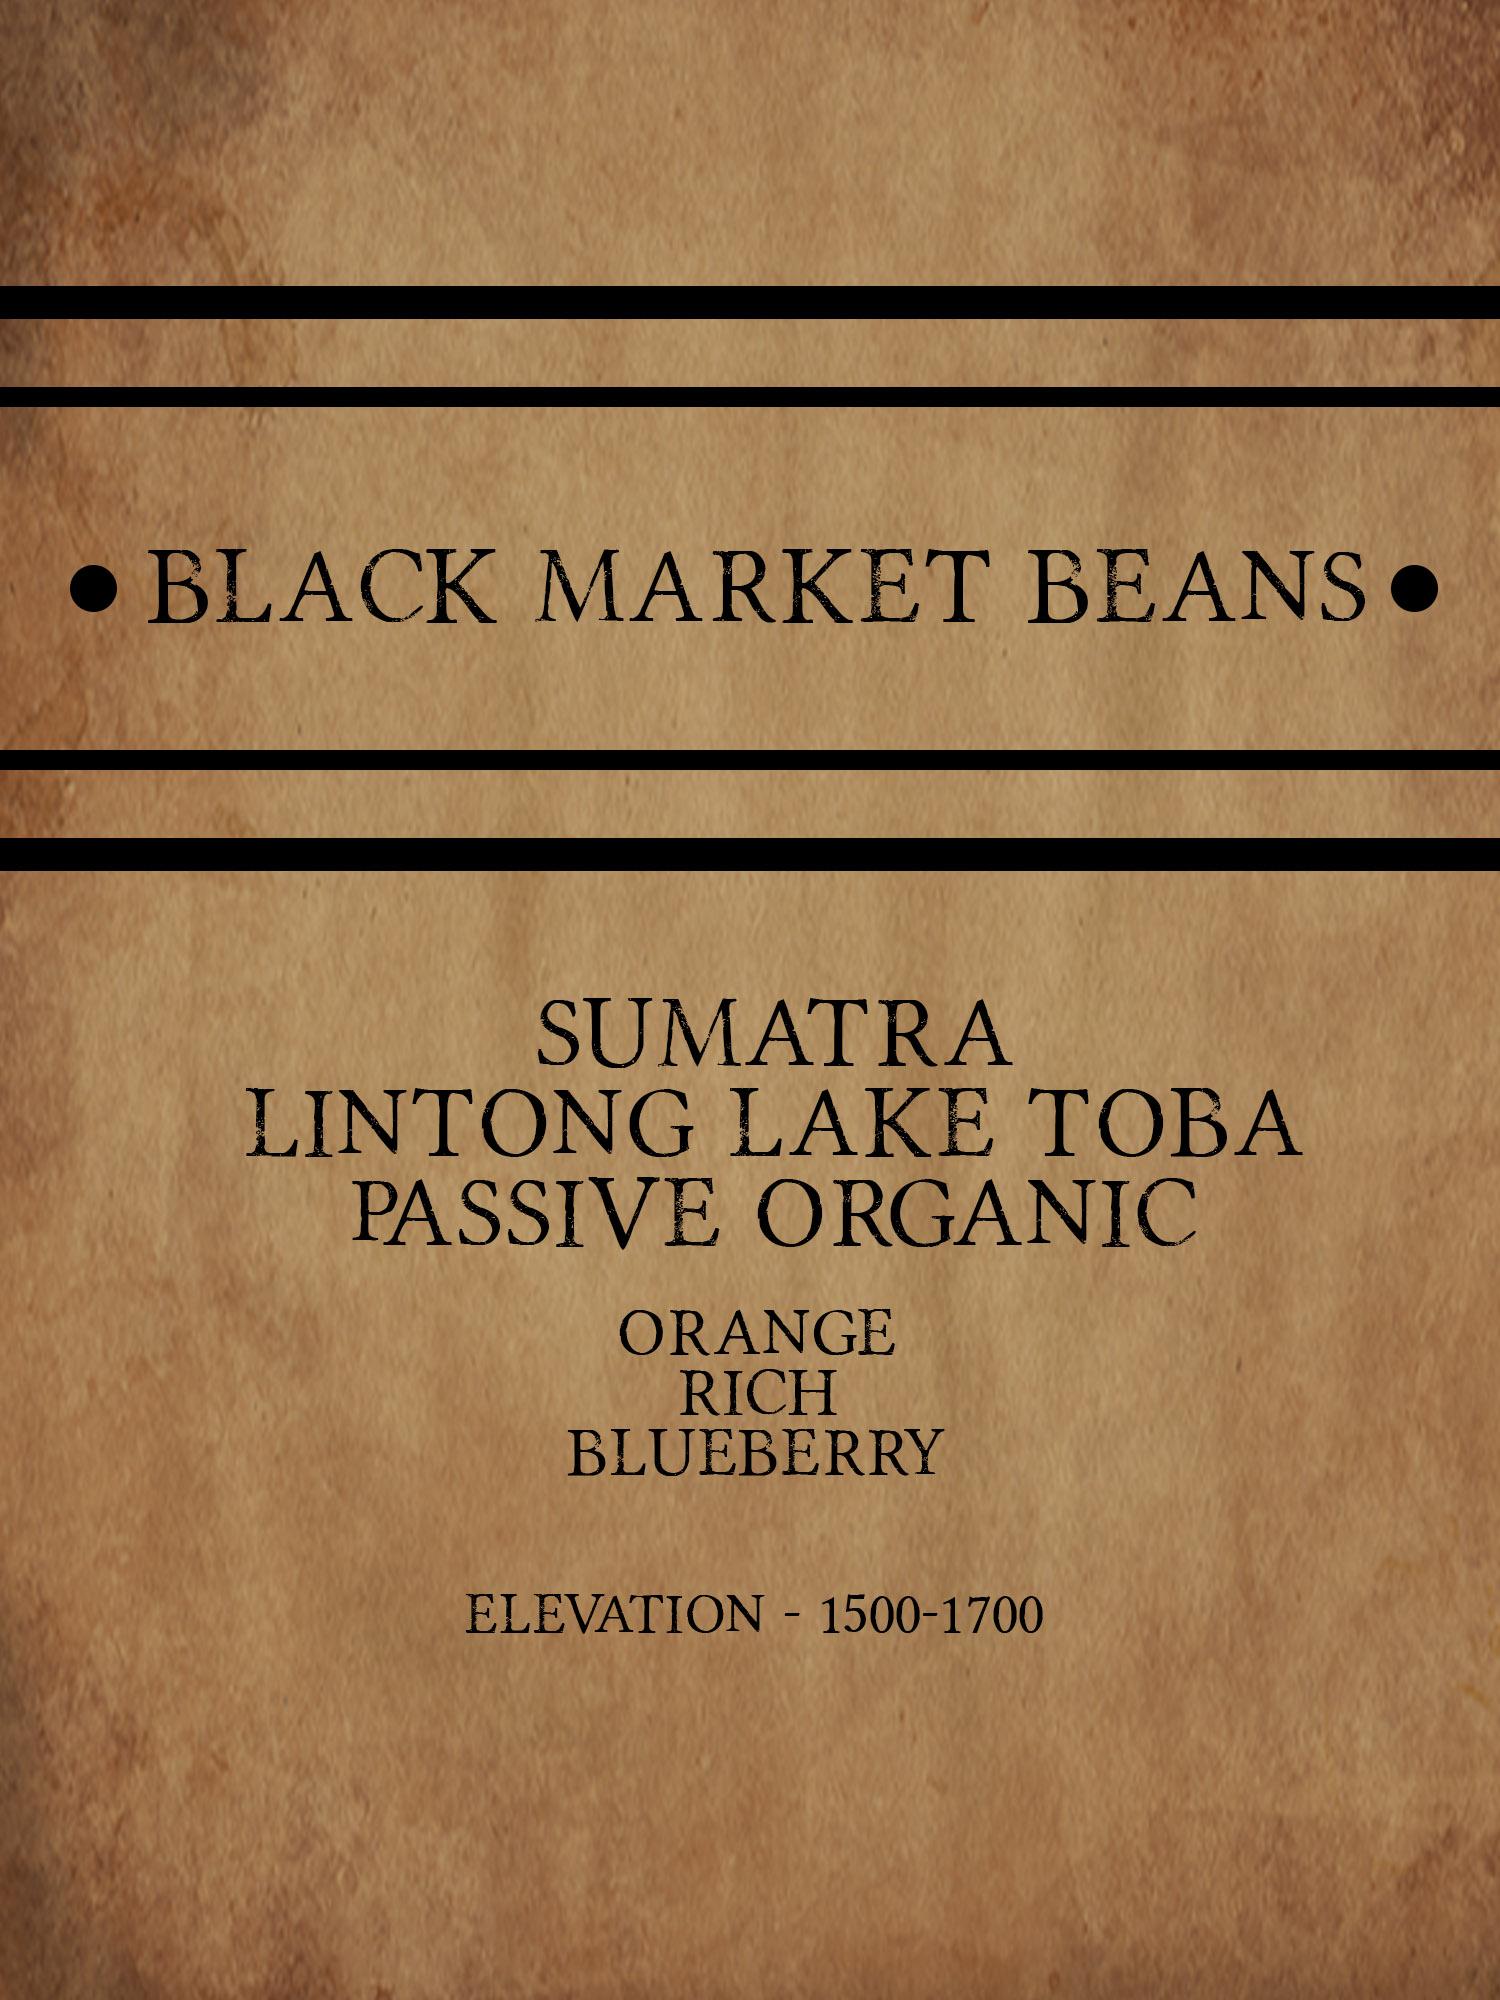 coffee_Sumatra_LakeToba_passiveorganic.jpg